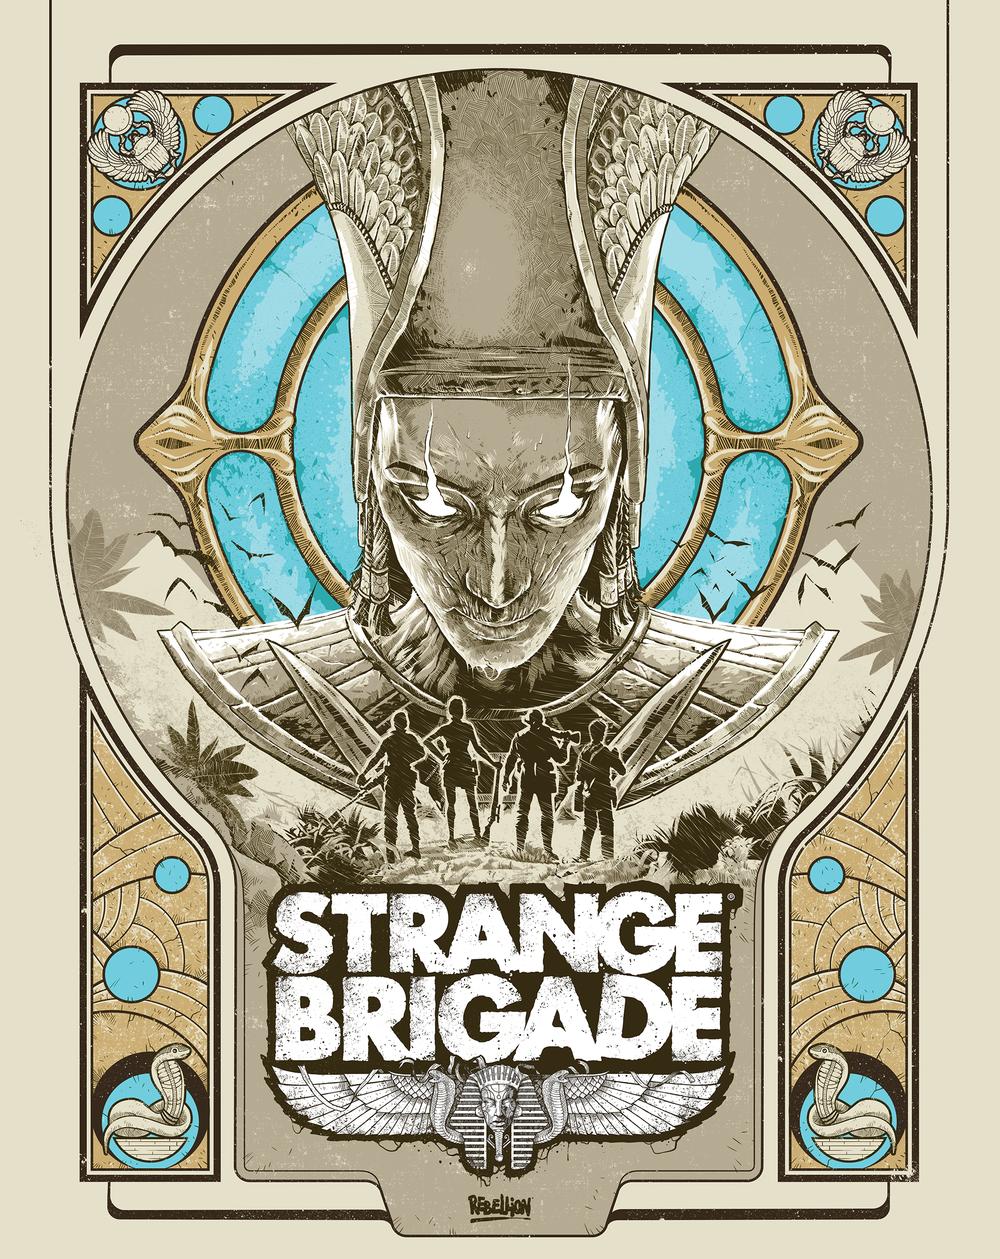 NERD: Strange Brigade - Luke Preece